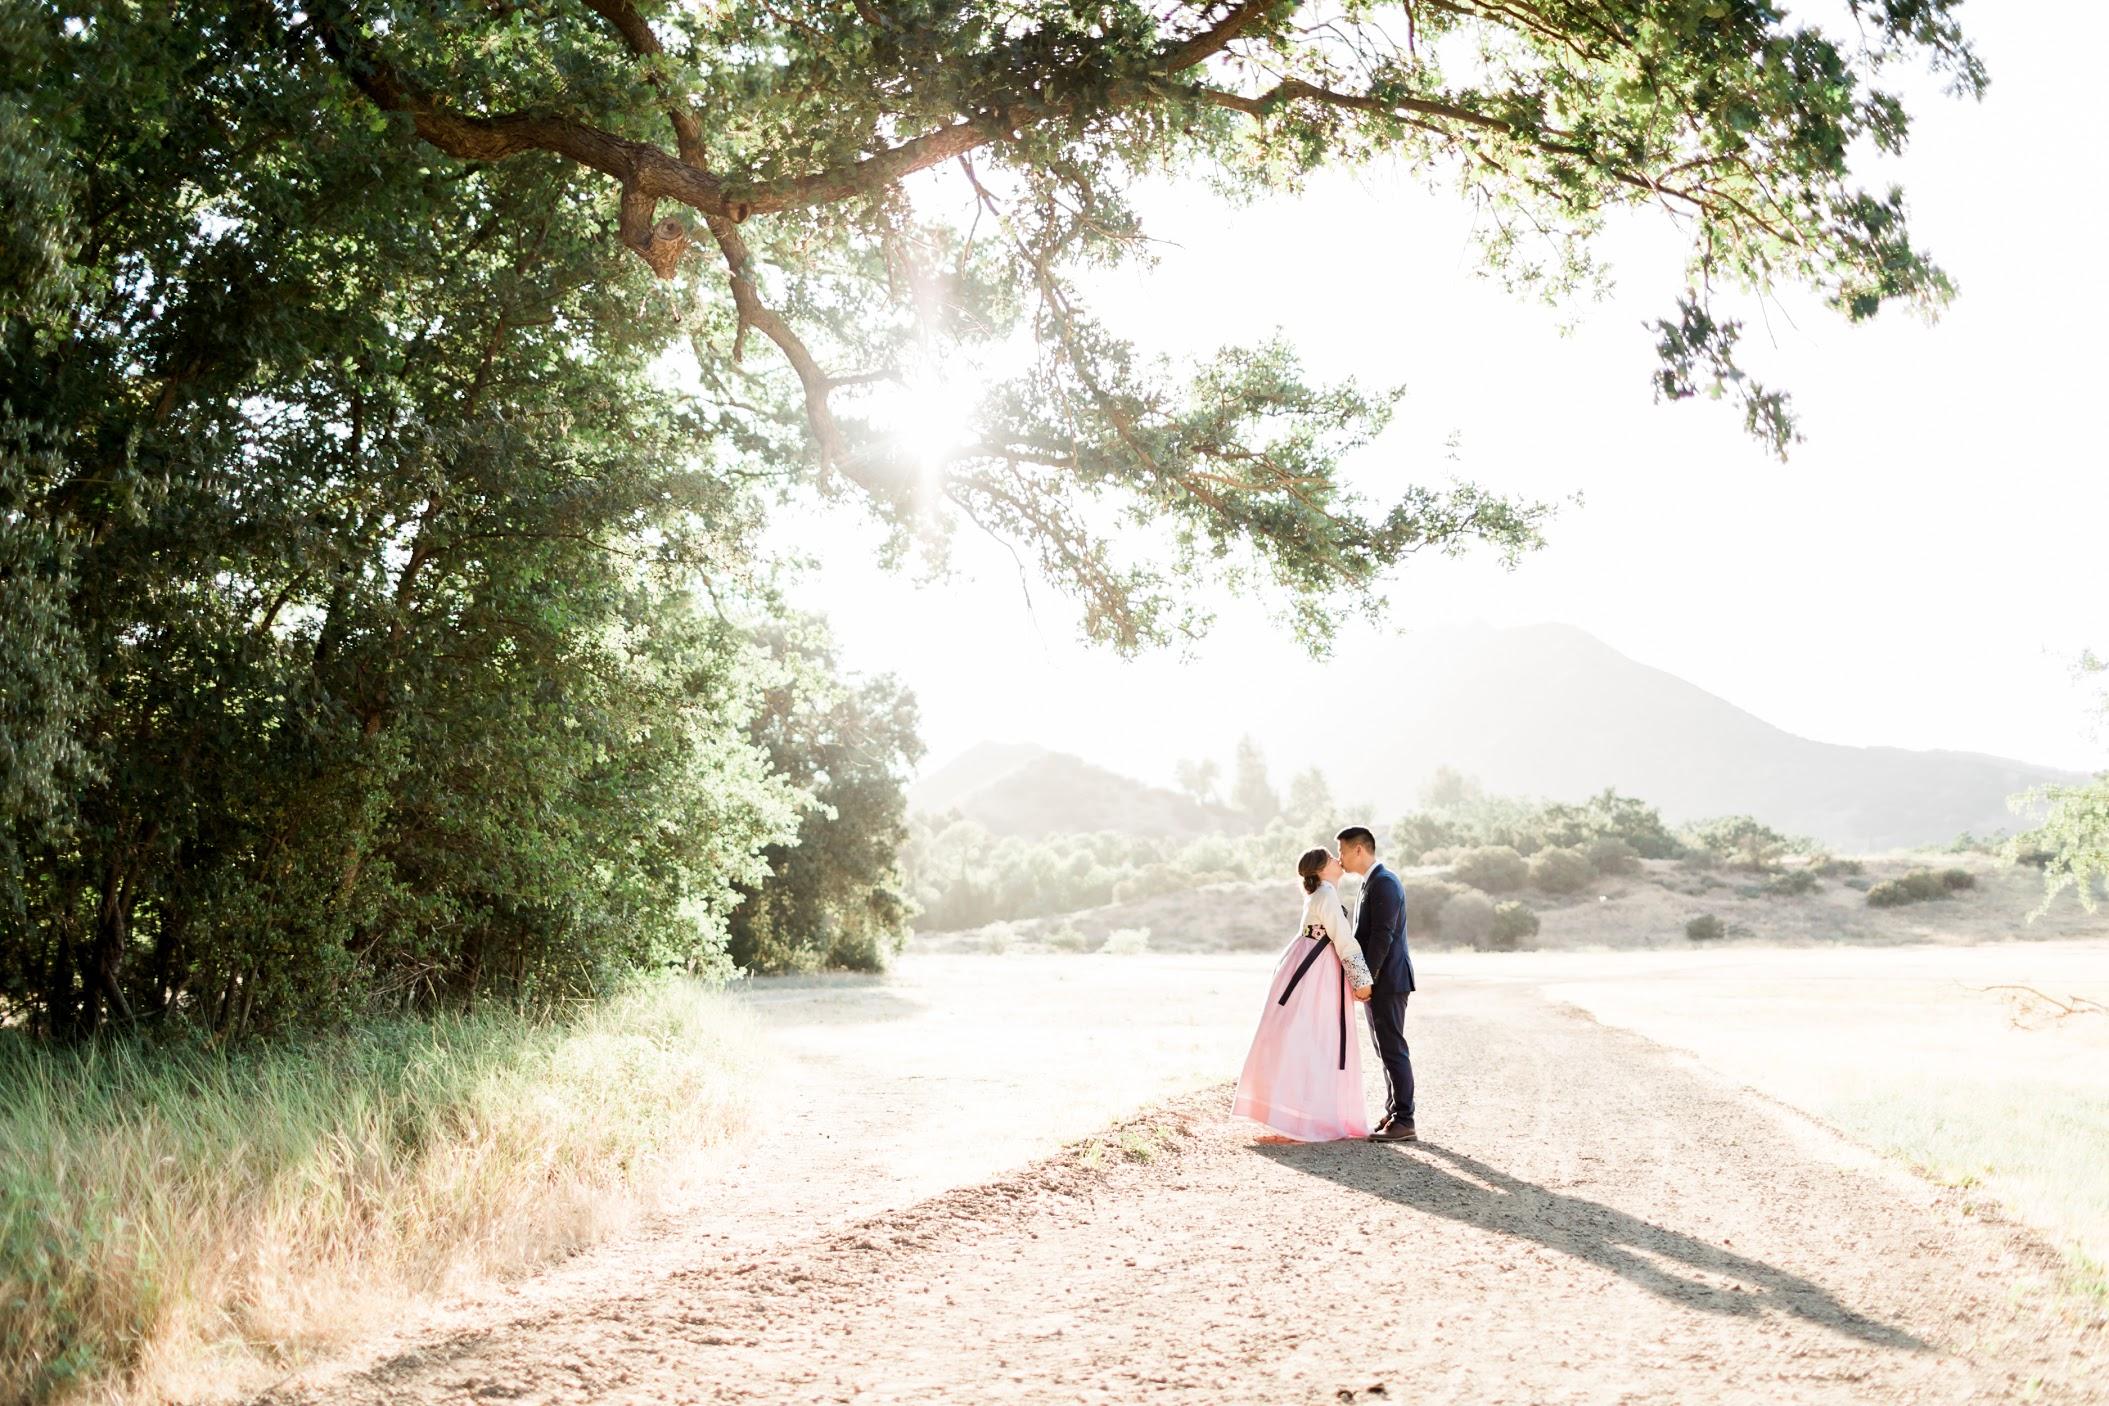 DianeJae_Engaged_KatieJacksonPhotography-160.jpg